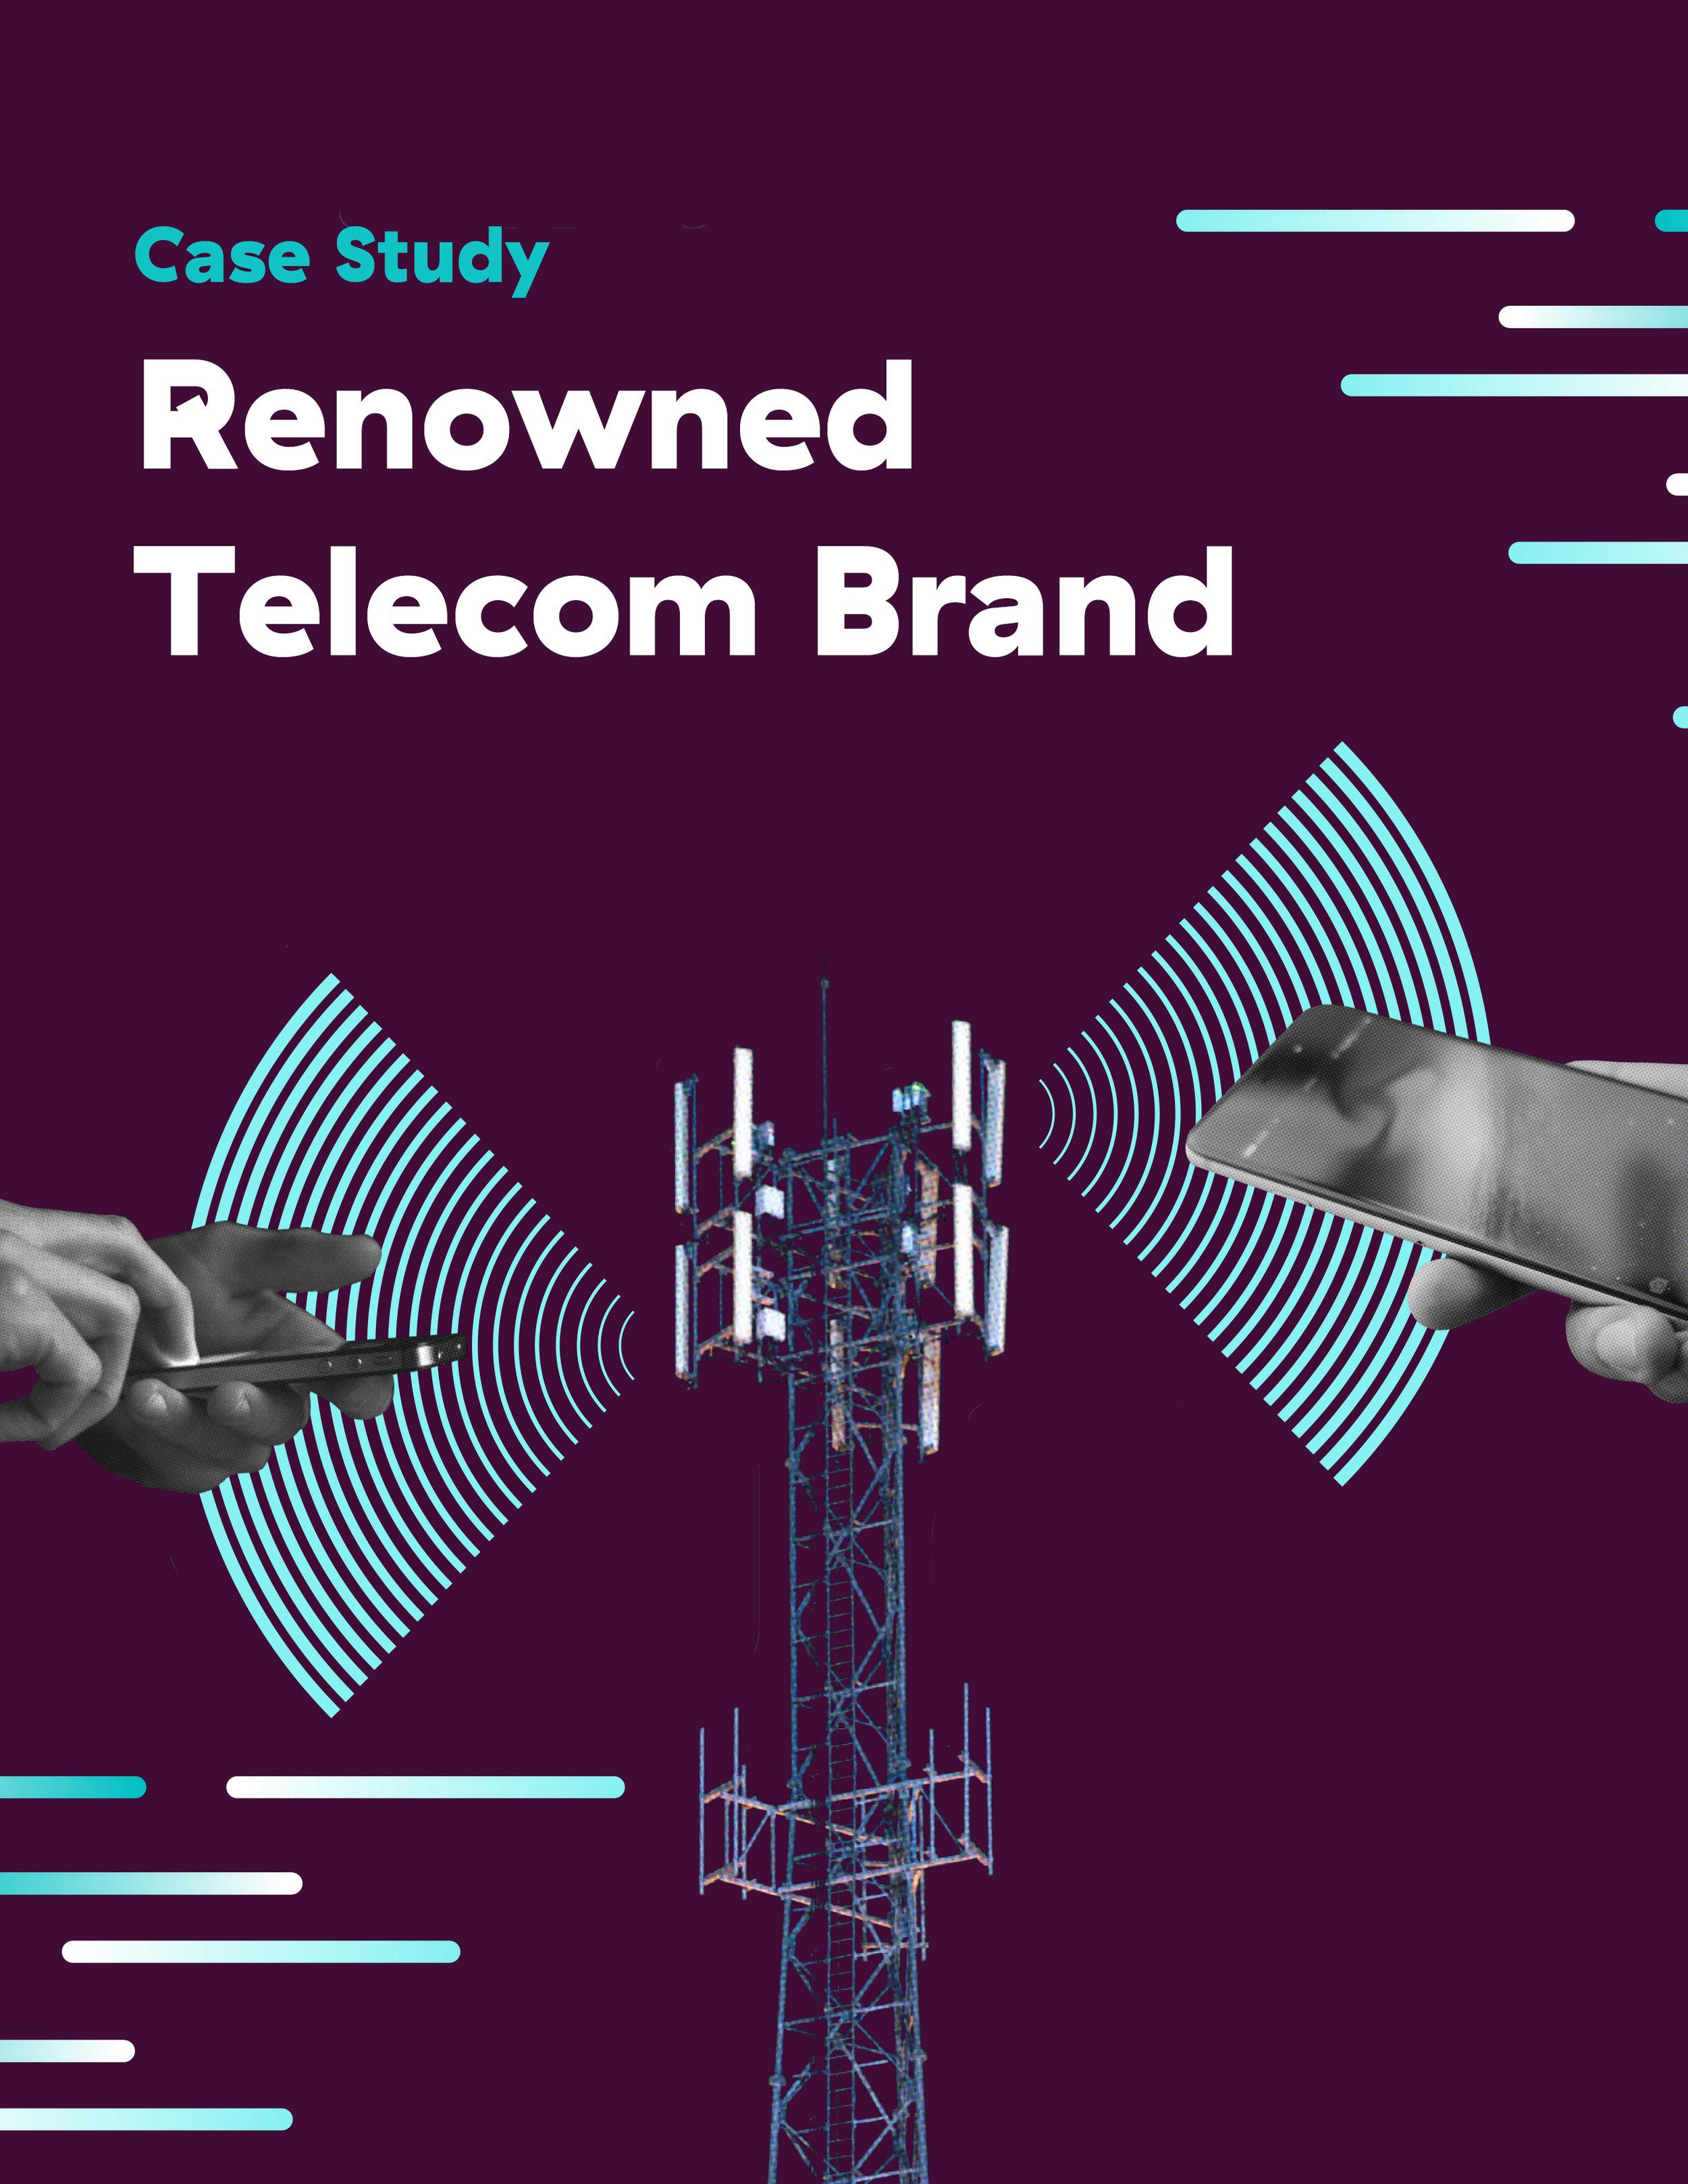 telecom-brand.jpg